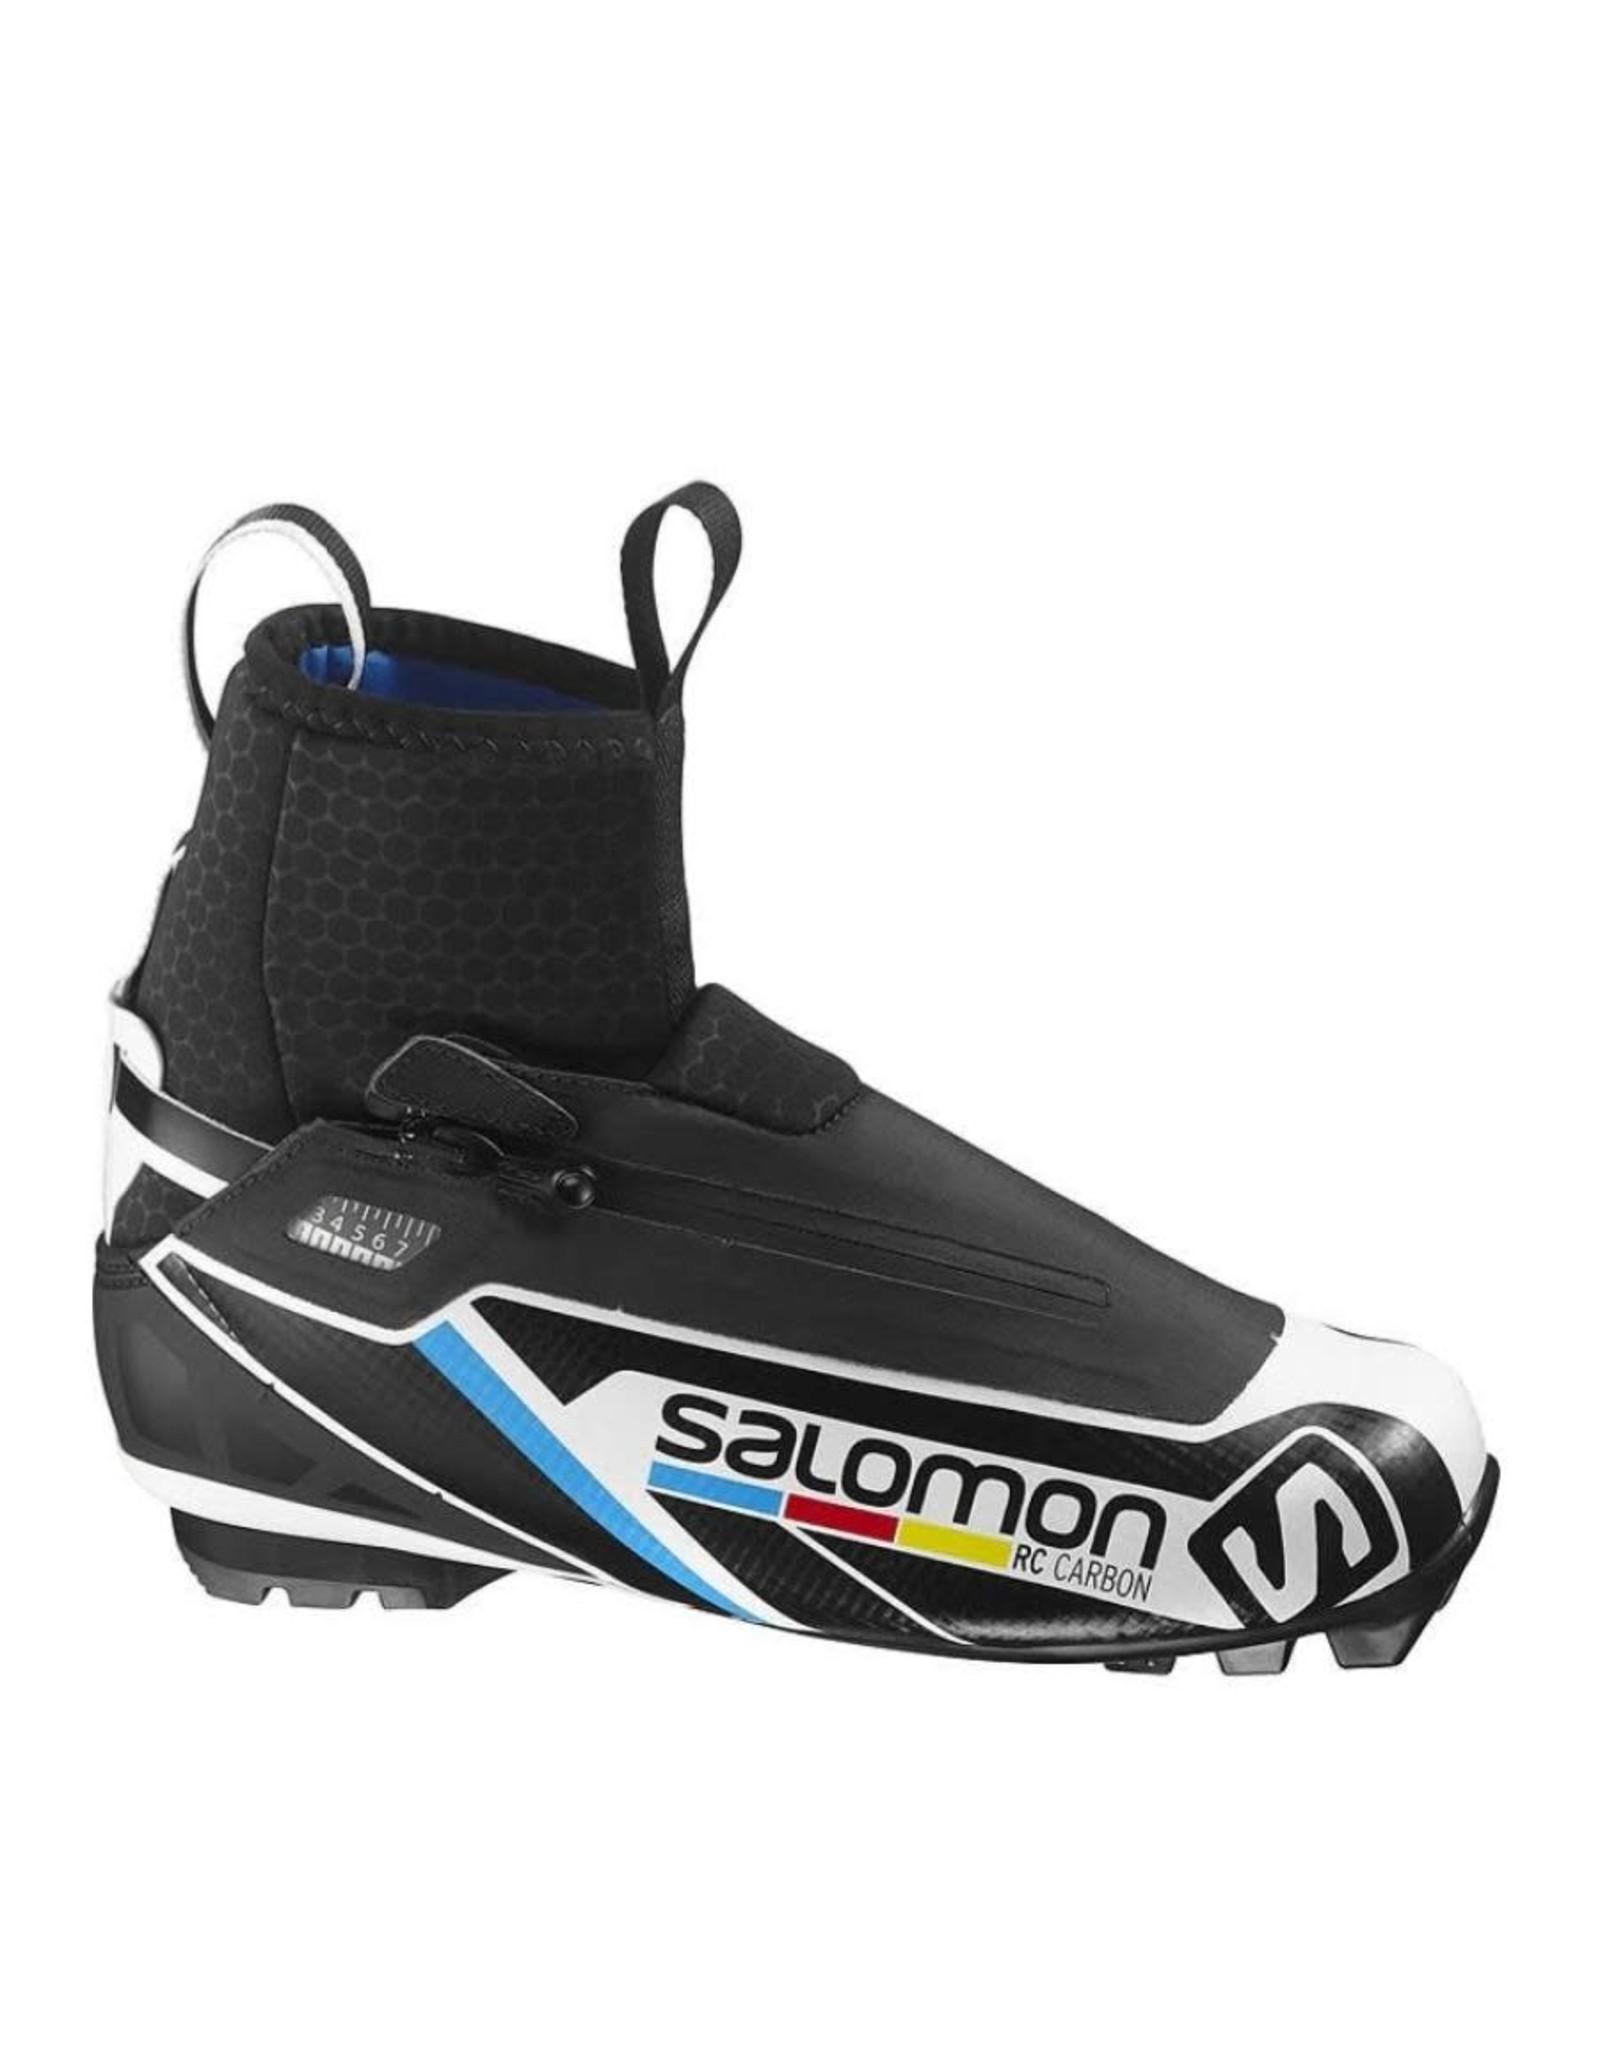 Salomon Salomon RC Carbon Prolink Boot